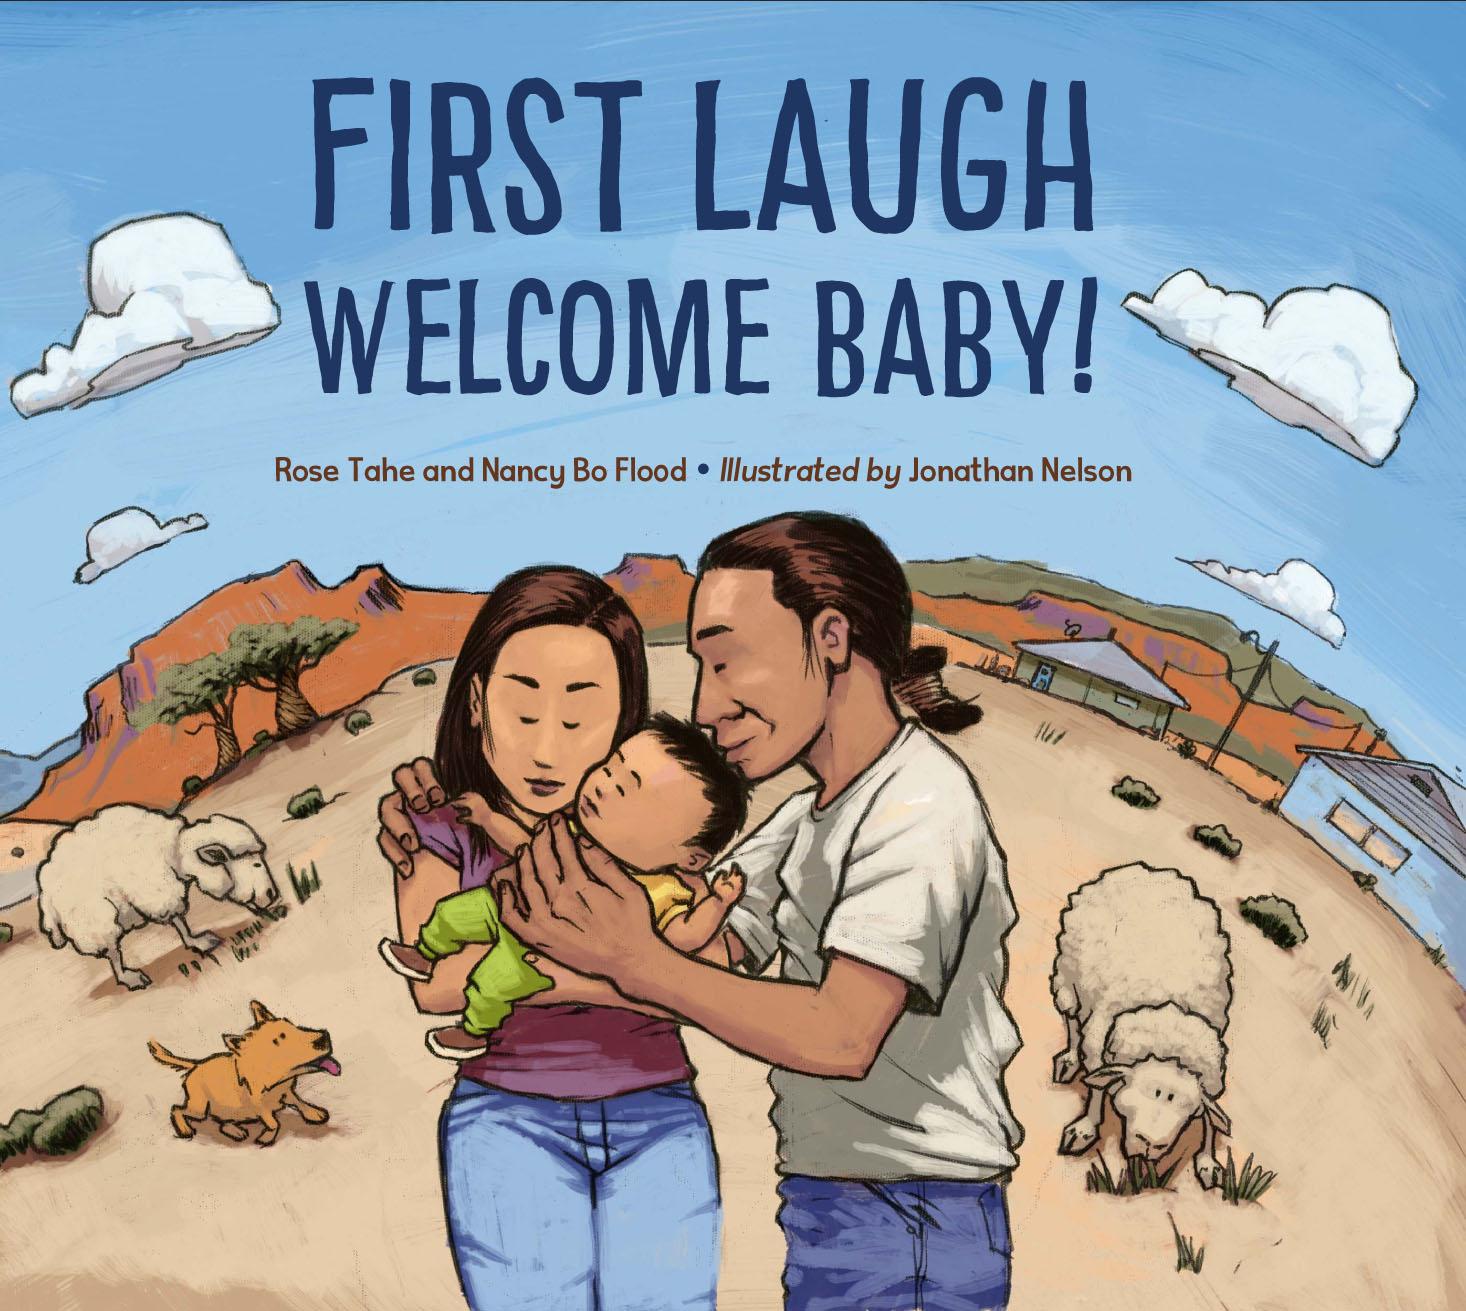 Native Author-Illustrator Interview: Jonathan Nelson - Cynthia